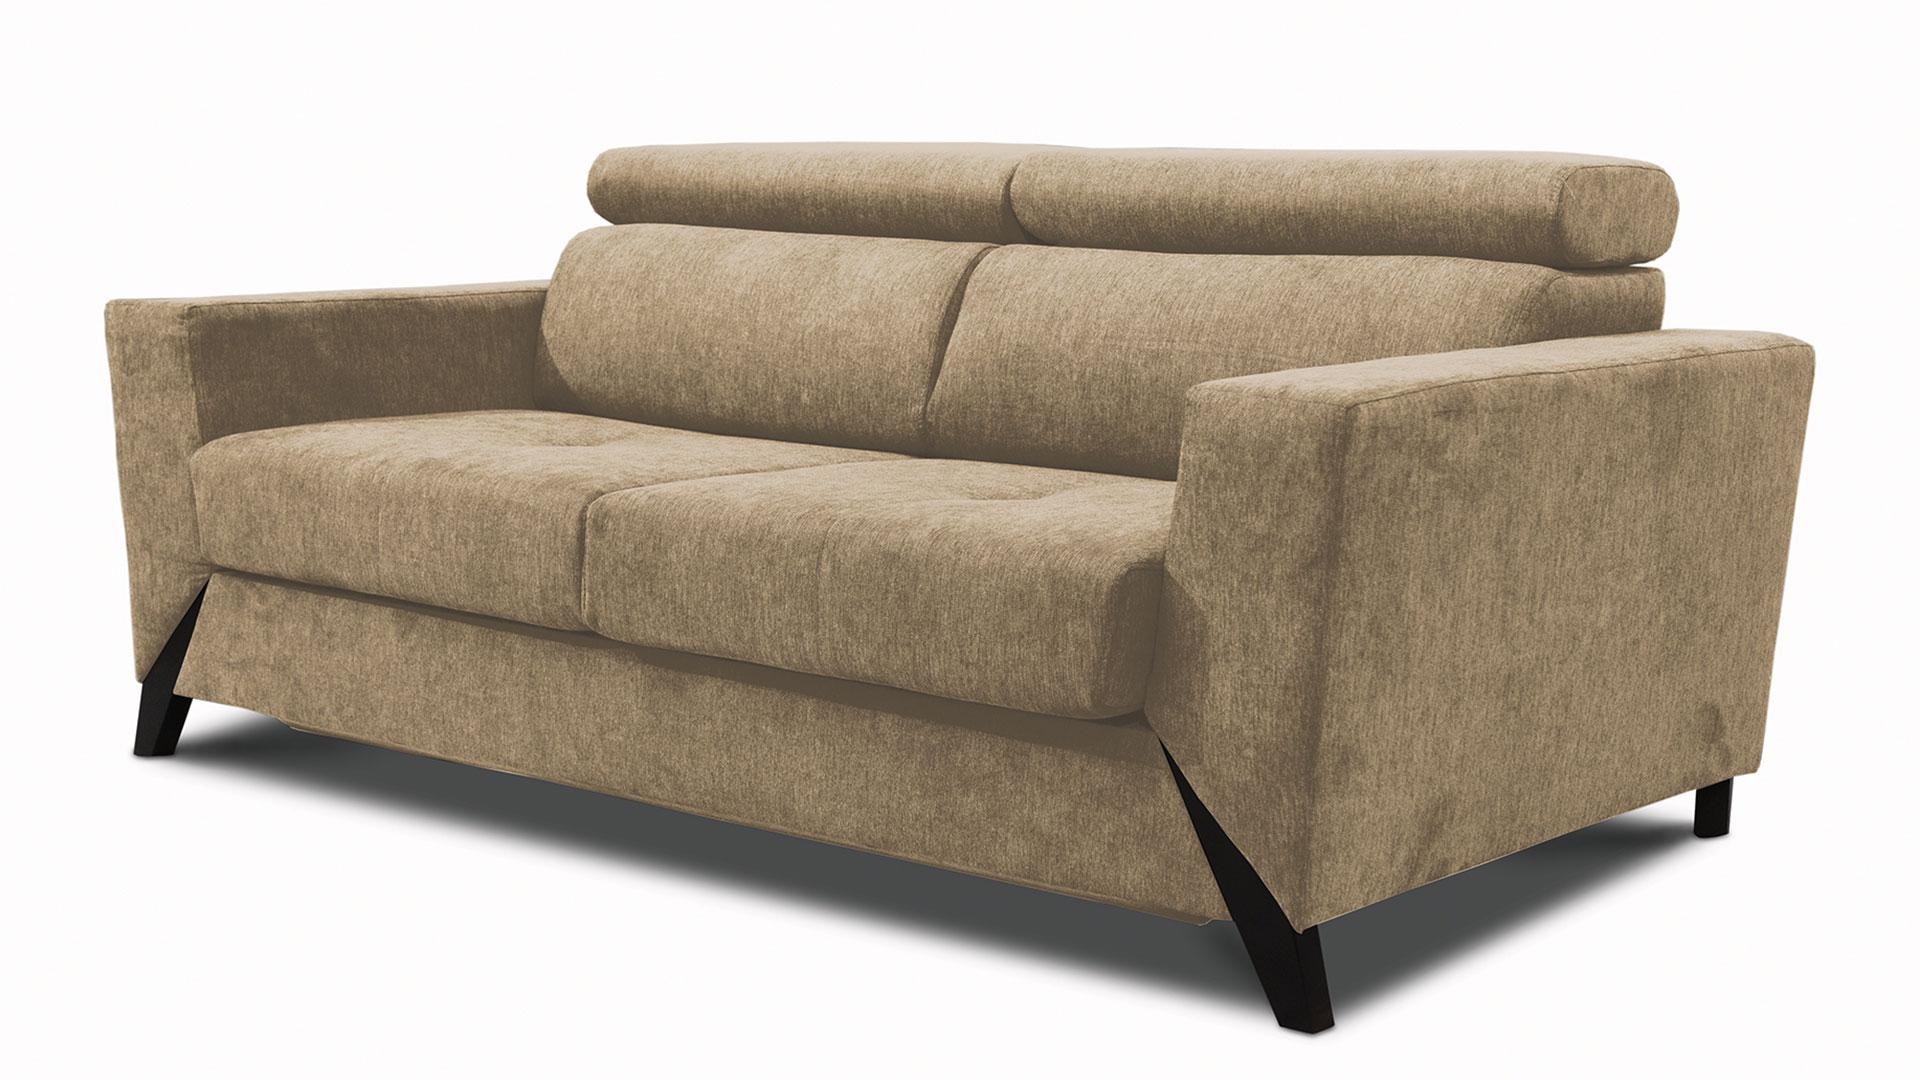 Sofa with sleeping function Salsa